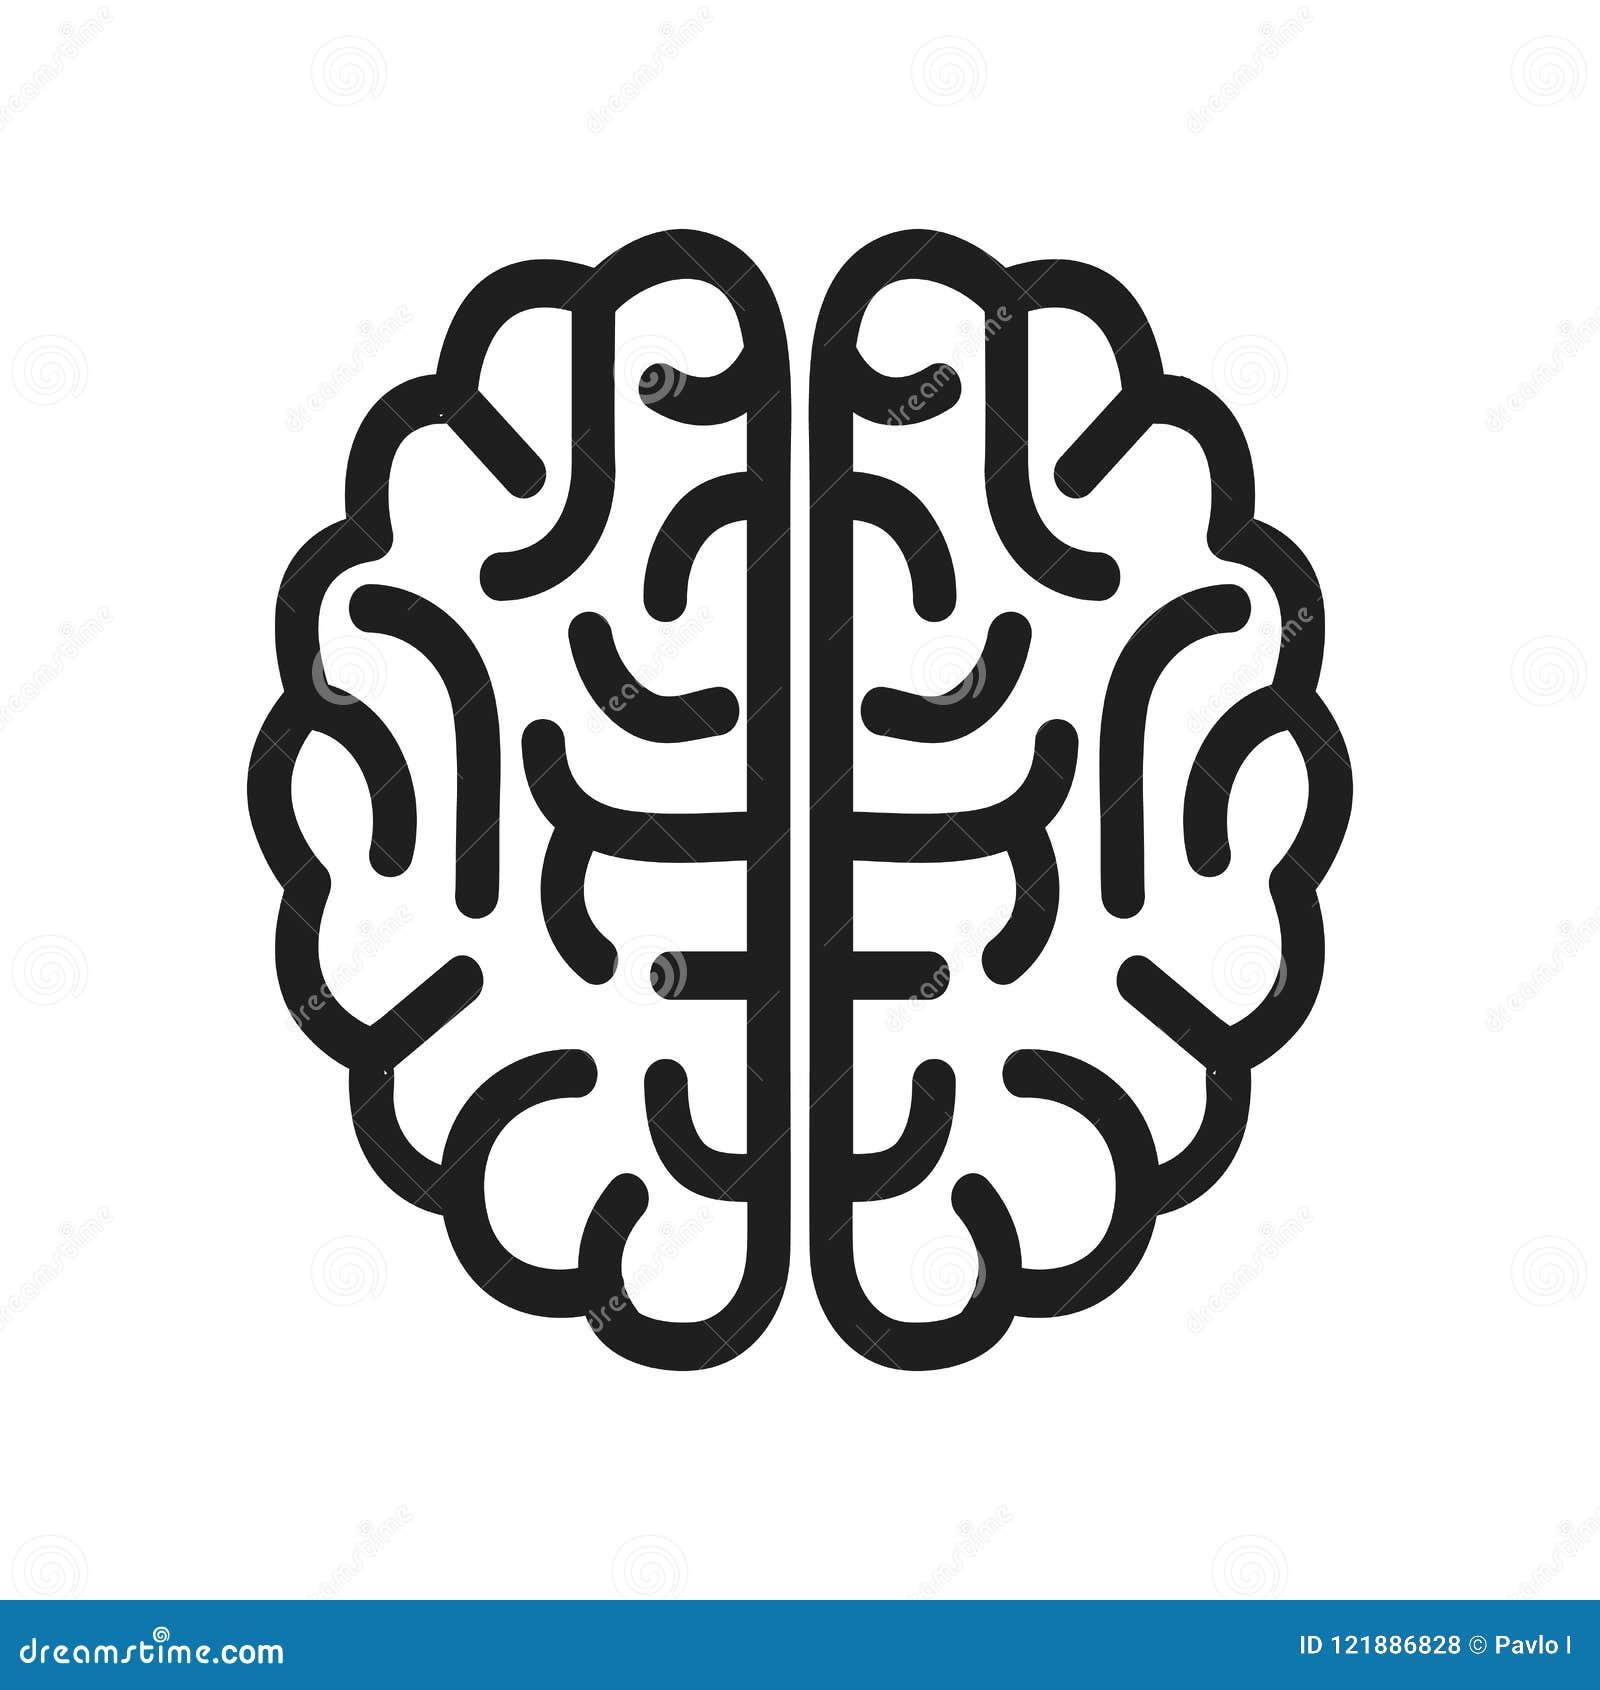 Icono del cerebro humano - vector